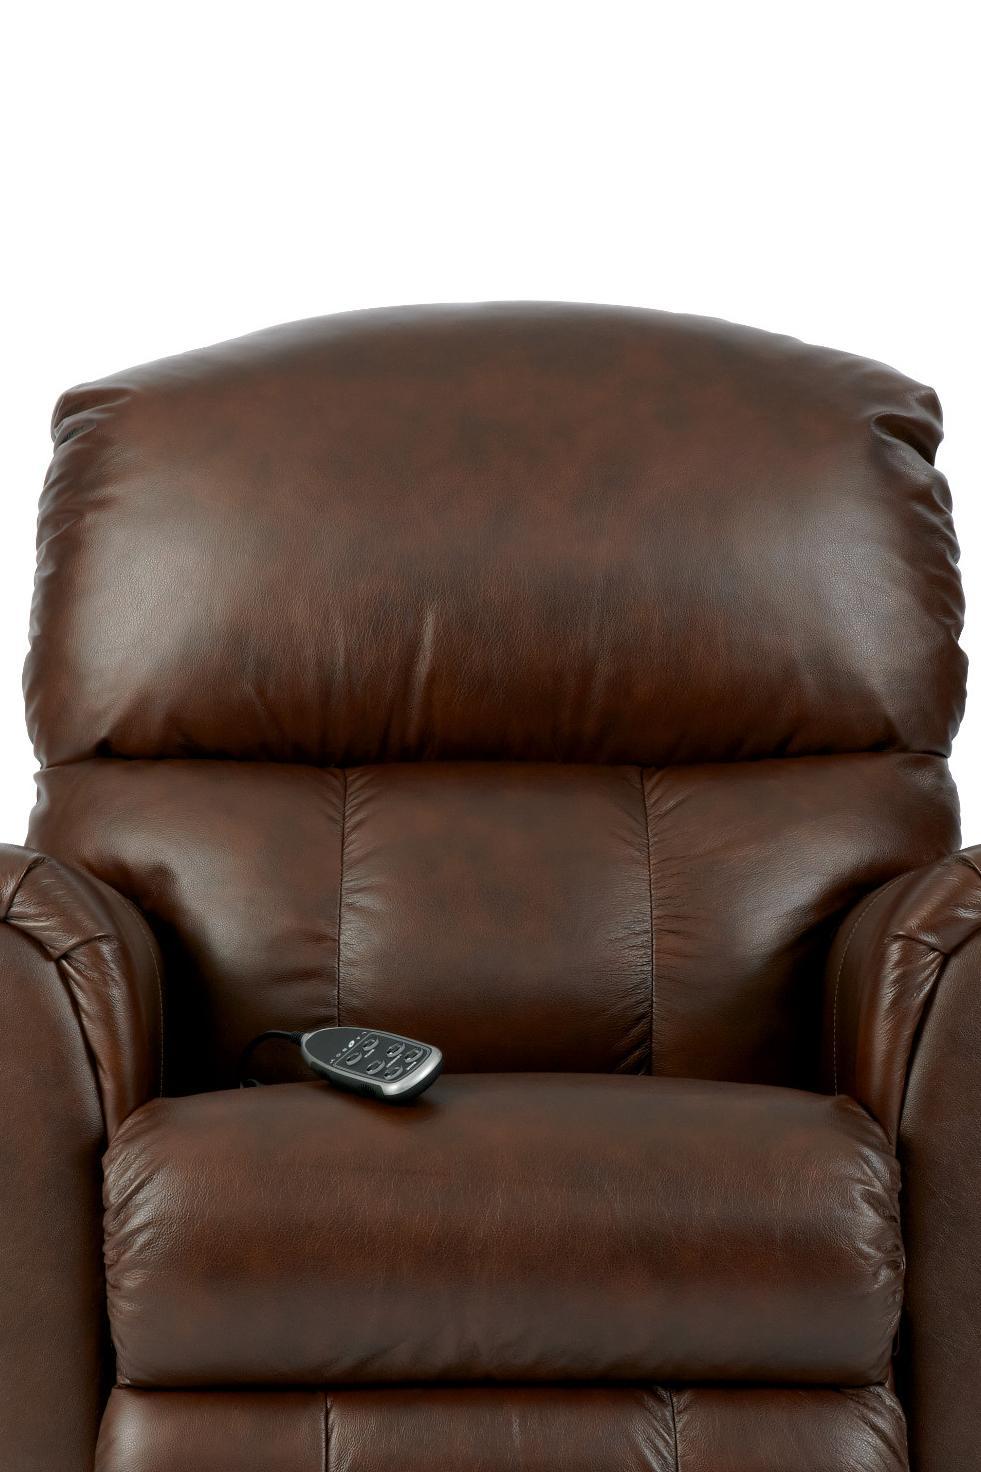 Enjoyable Briggs 701 By La Z Boy Conlins Furniture La Z Boy Ibusinesslaw Wood Chair Design Ideas Ibusinesslaworg